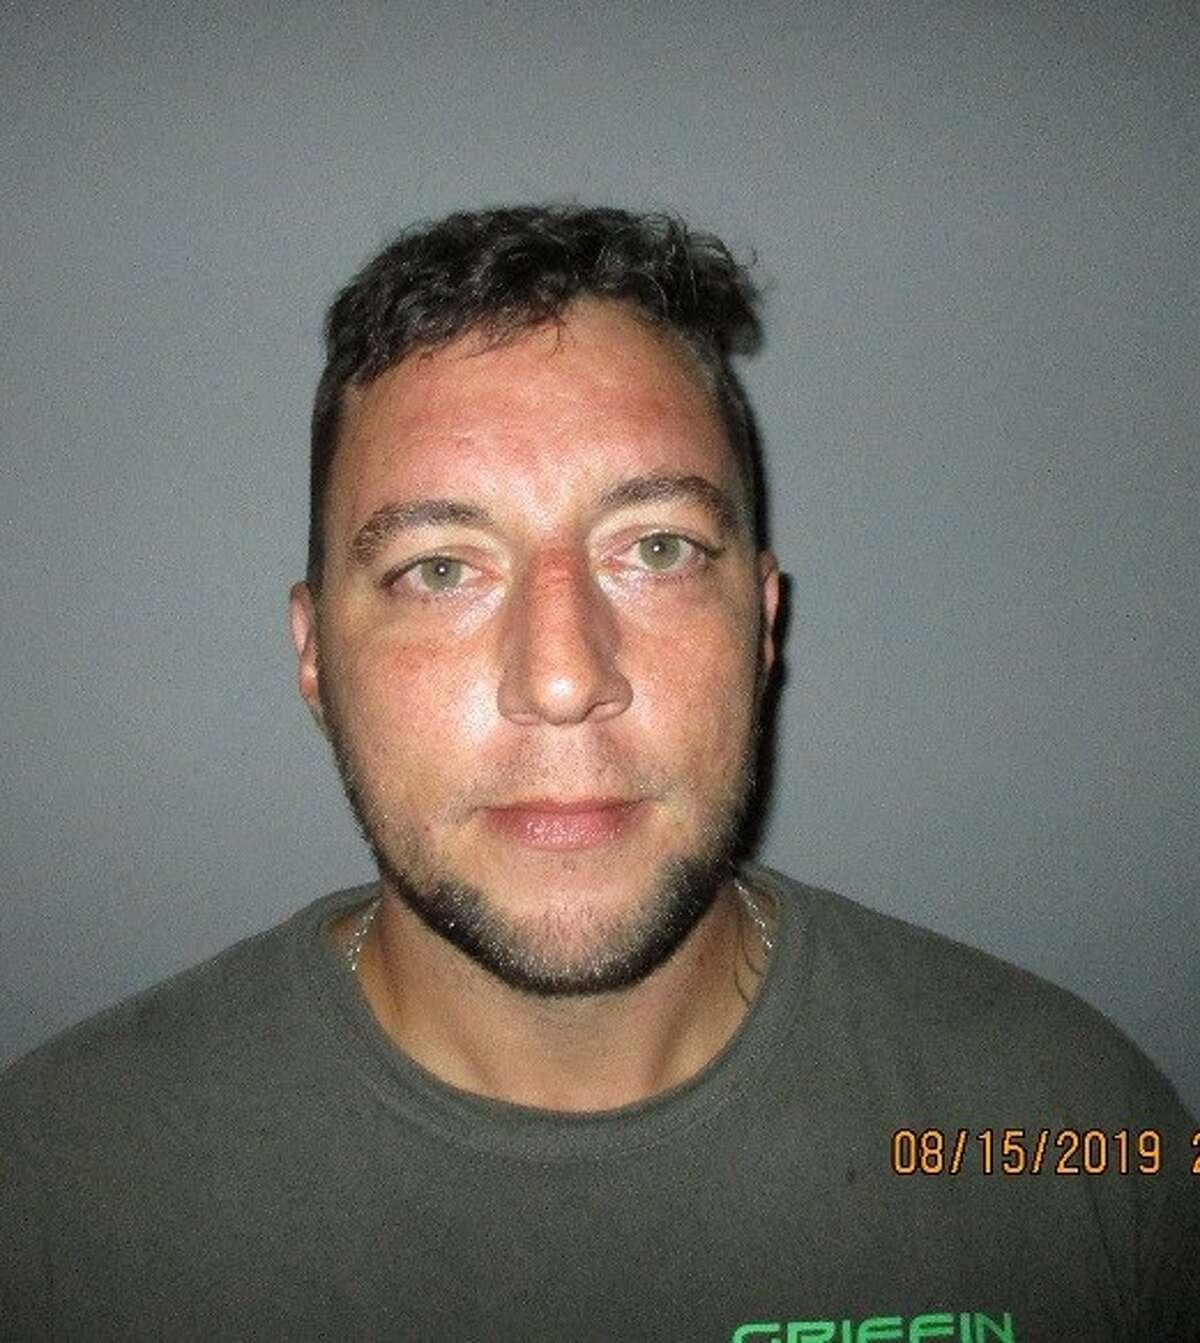 John Reckner (Photo courtesy of the Stillwater Police Department)